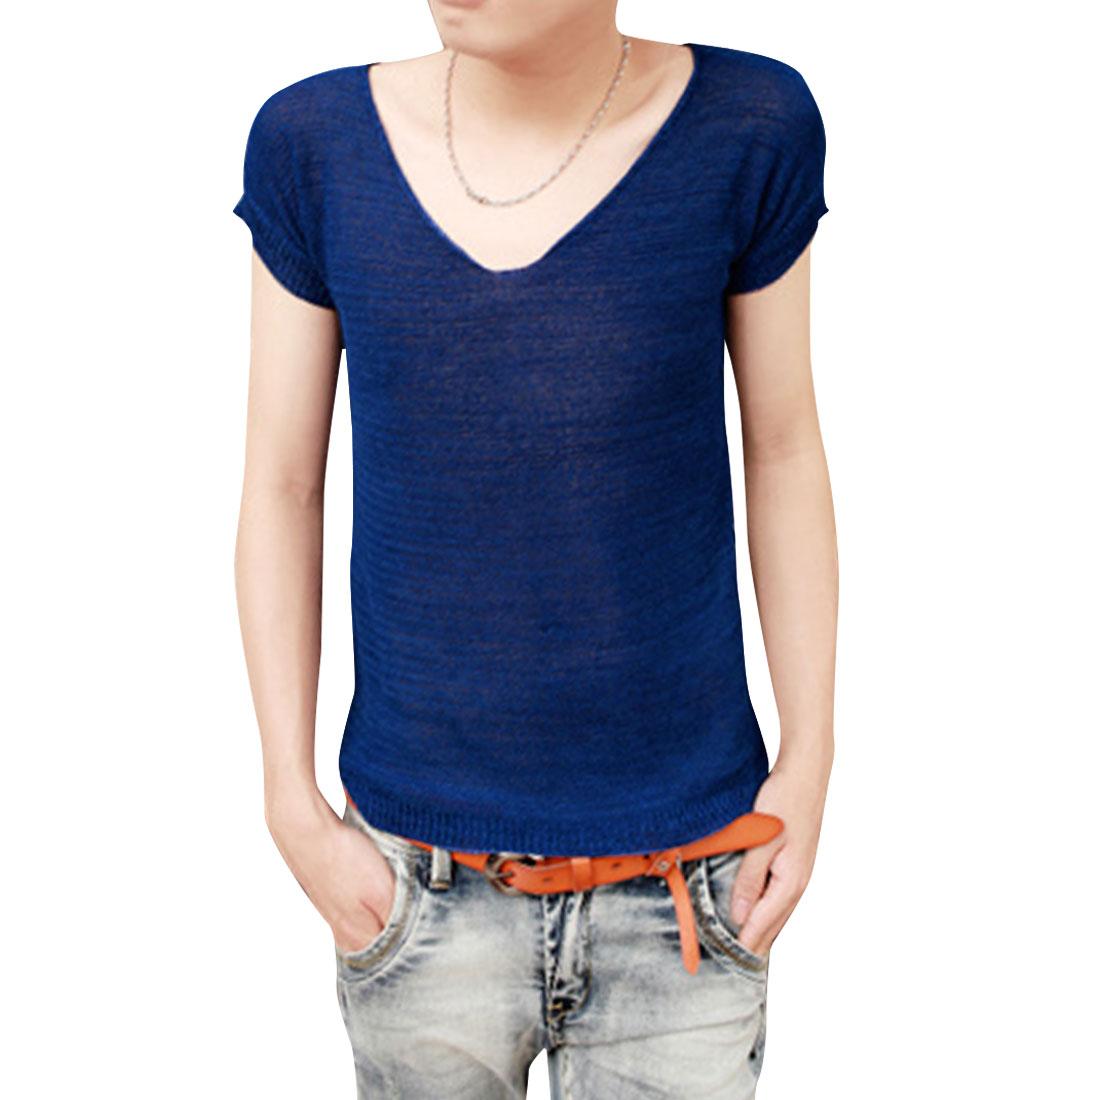 Men V Neck Semi-sheer Elastic Dark Blue Leisure Knit Top S